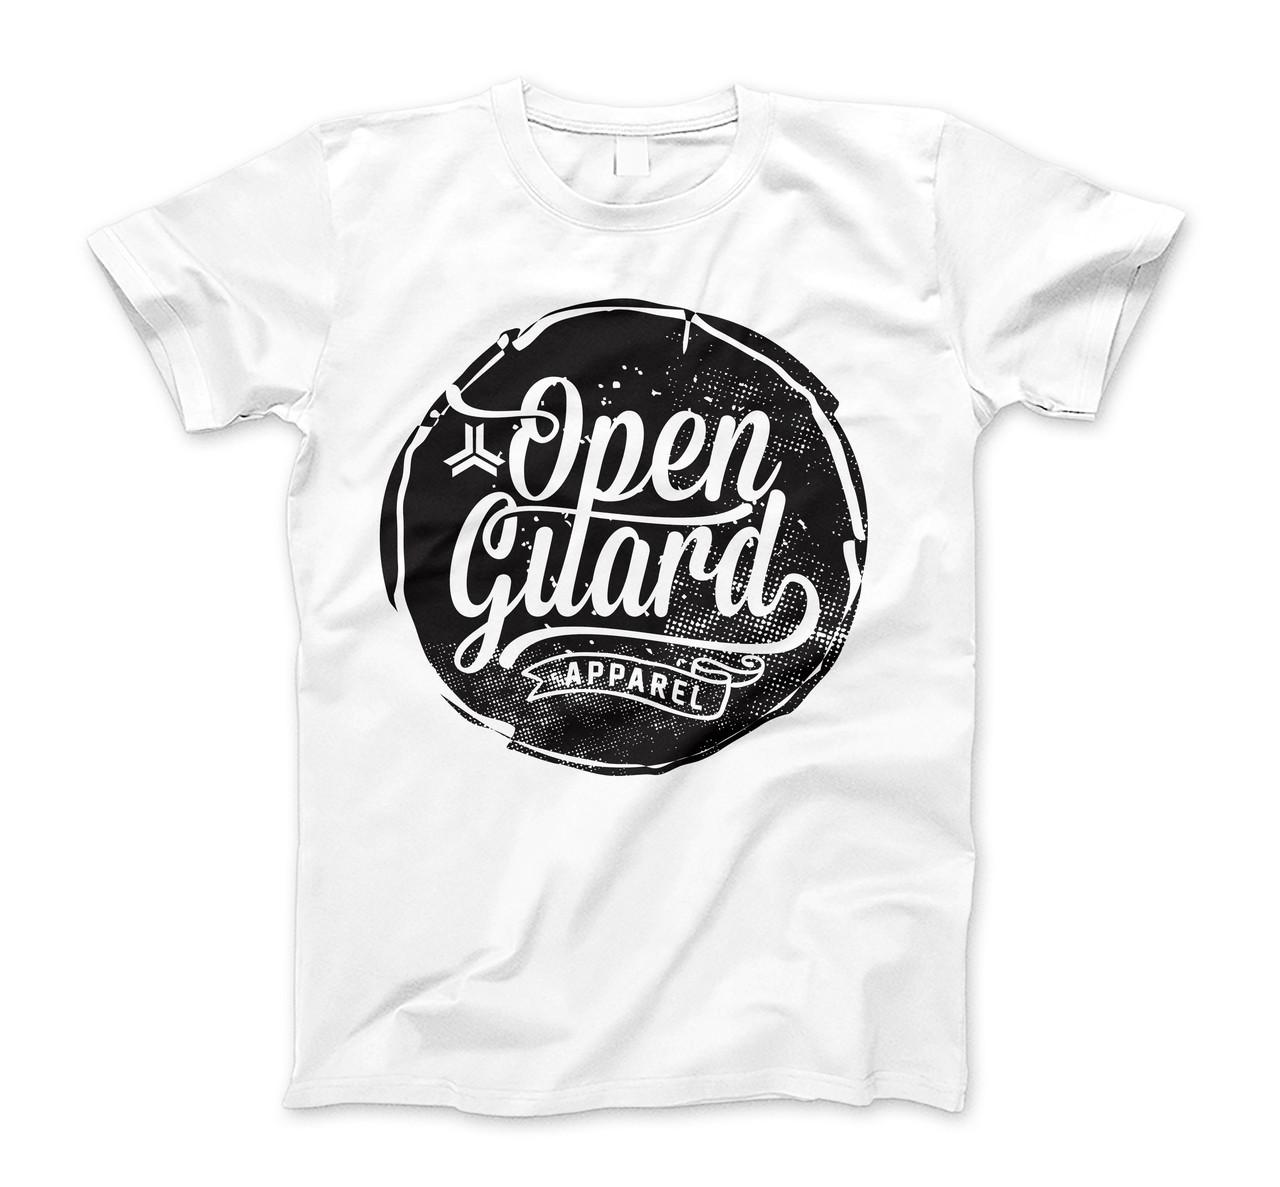 Open Guard Apparel Circle Flow T-Shirt available at www.thejiujitsushop.com or www.openguardapparel.com